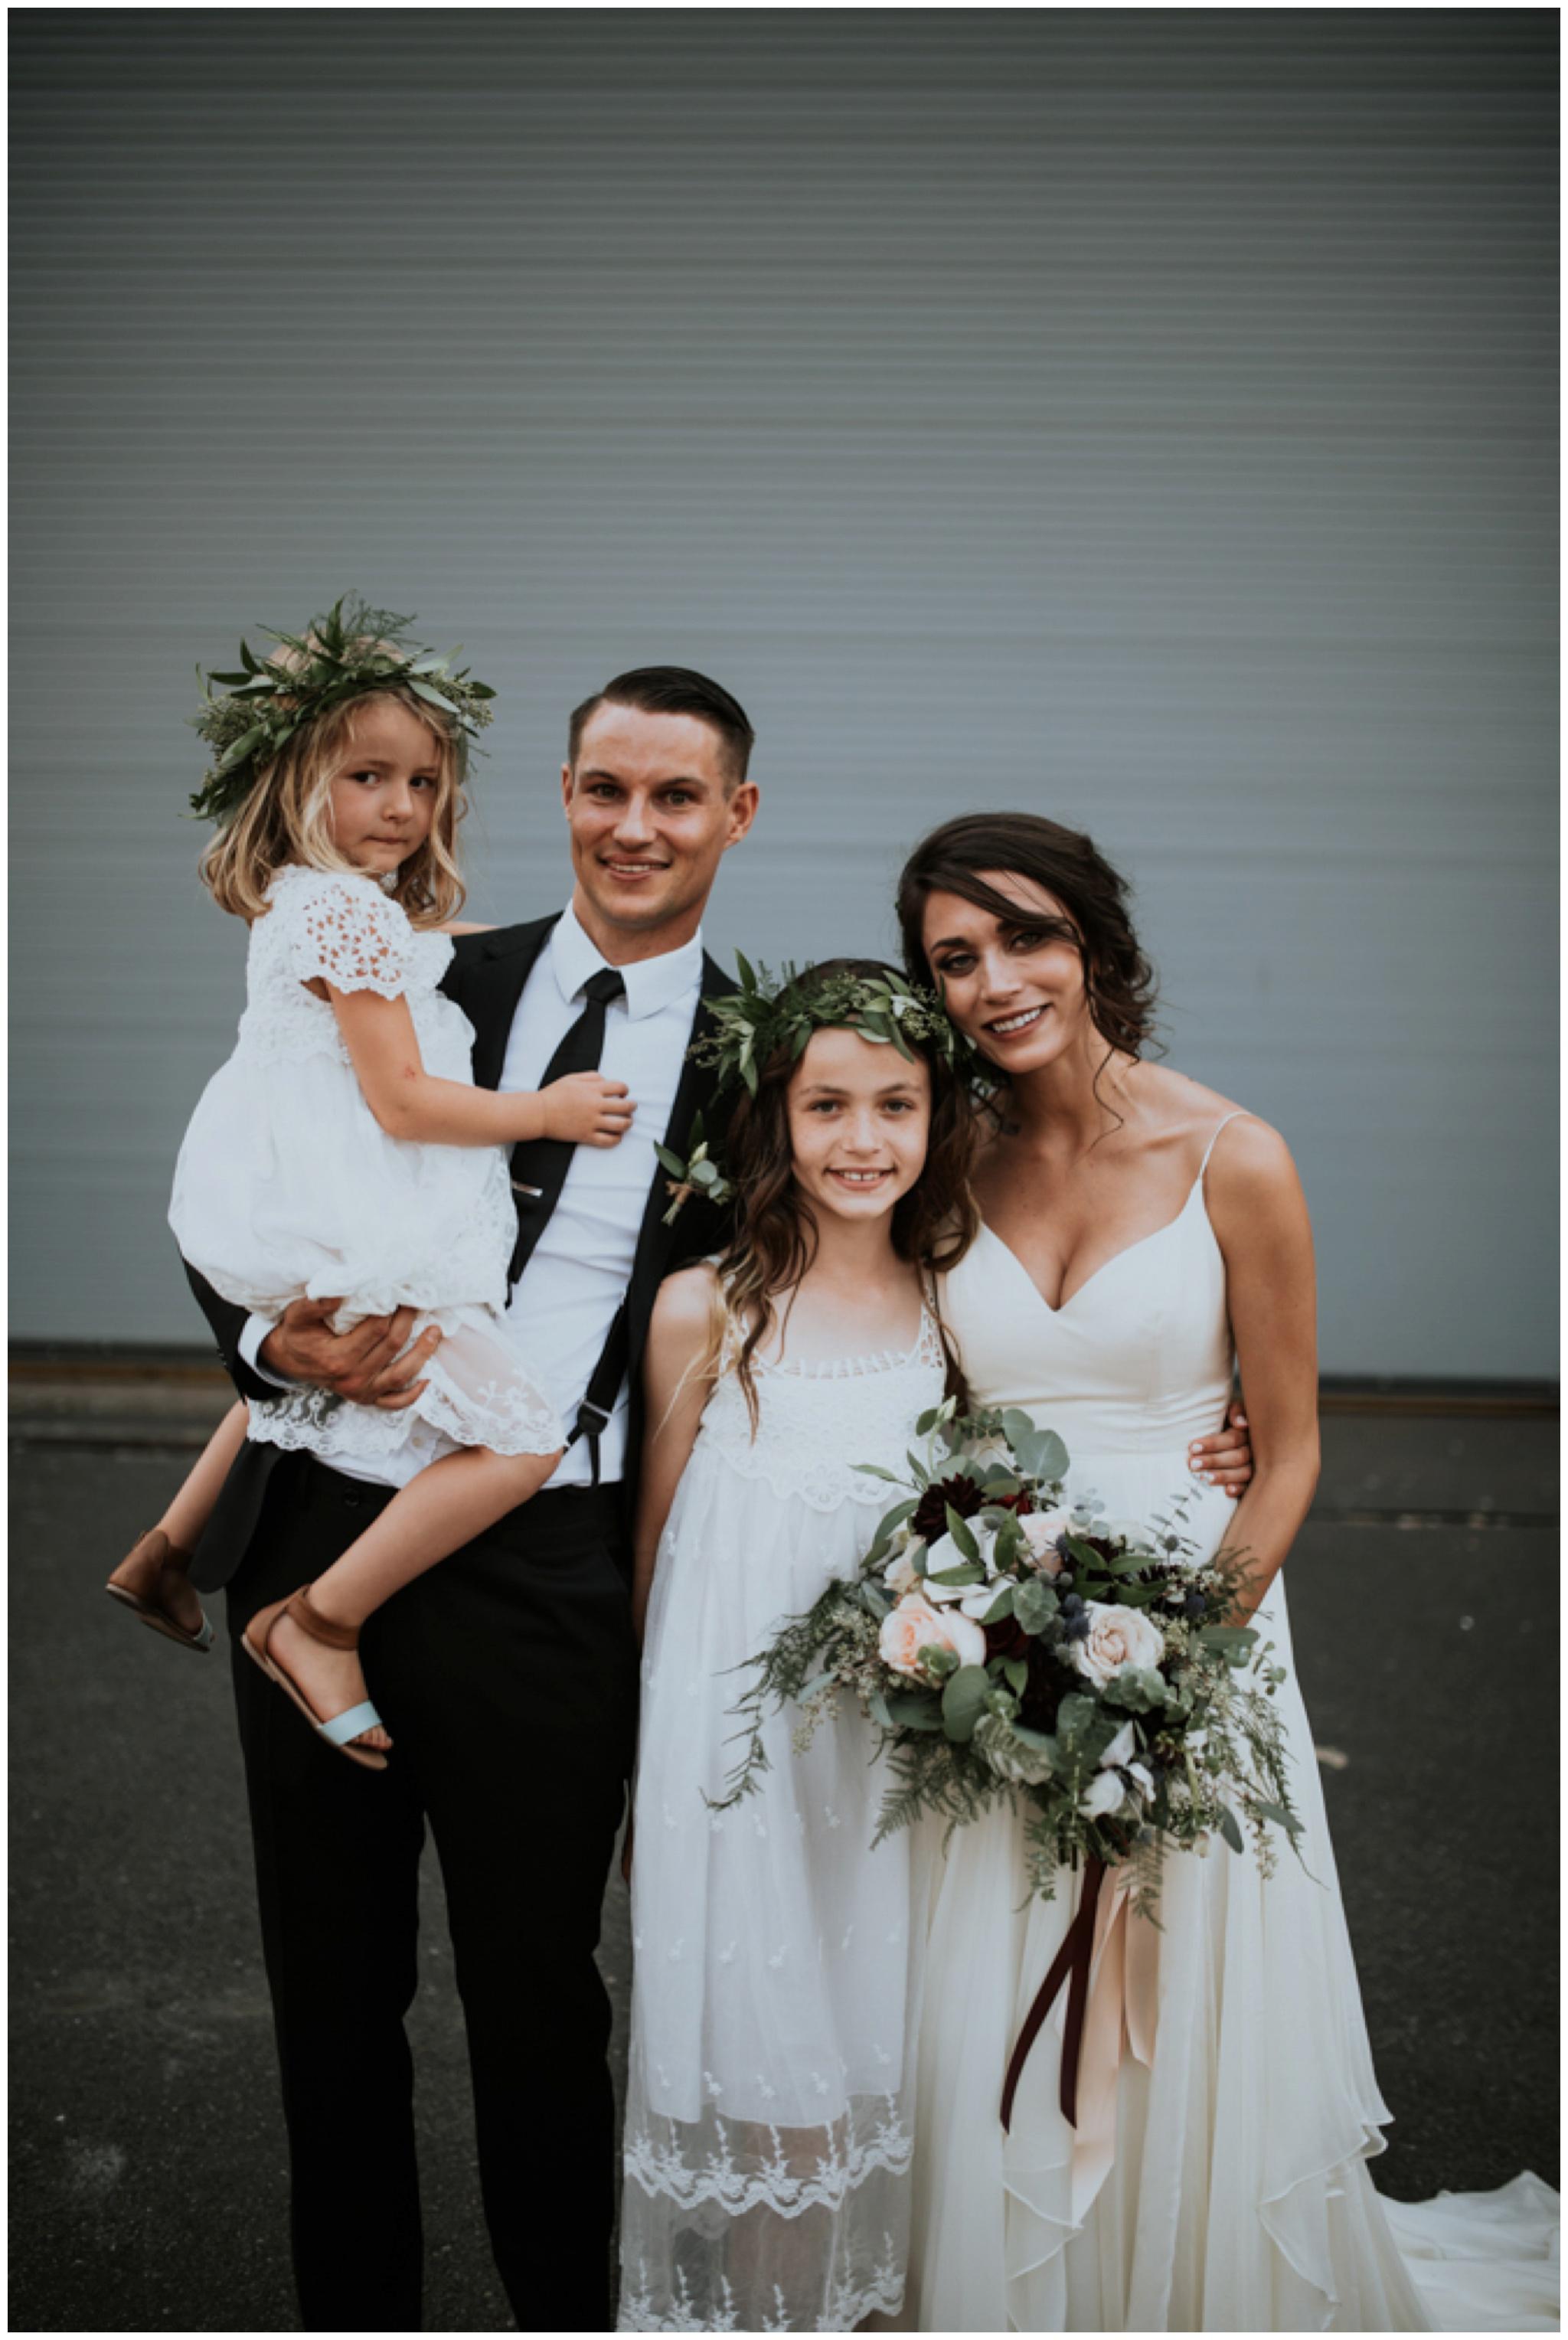 alyssa-keiran-westland-distillery-urban-seattle-wedding-photographer-caitlyn-nikula-127.jpg